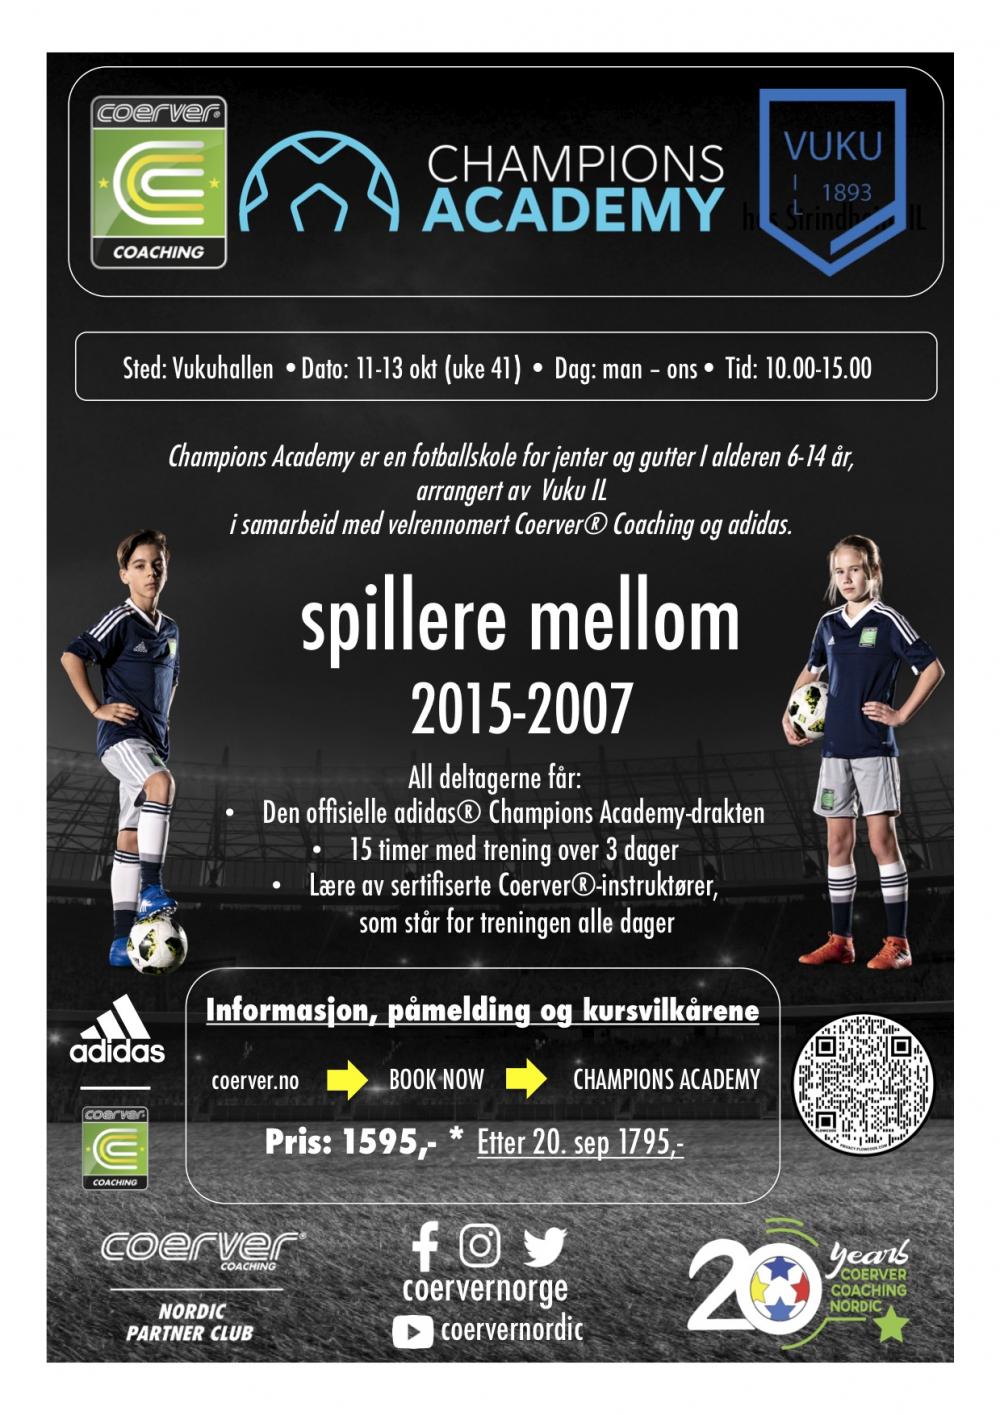 Champions Academy hos Vuku IL 2021